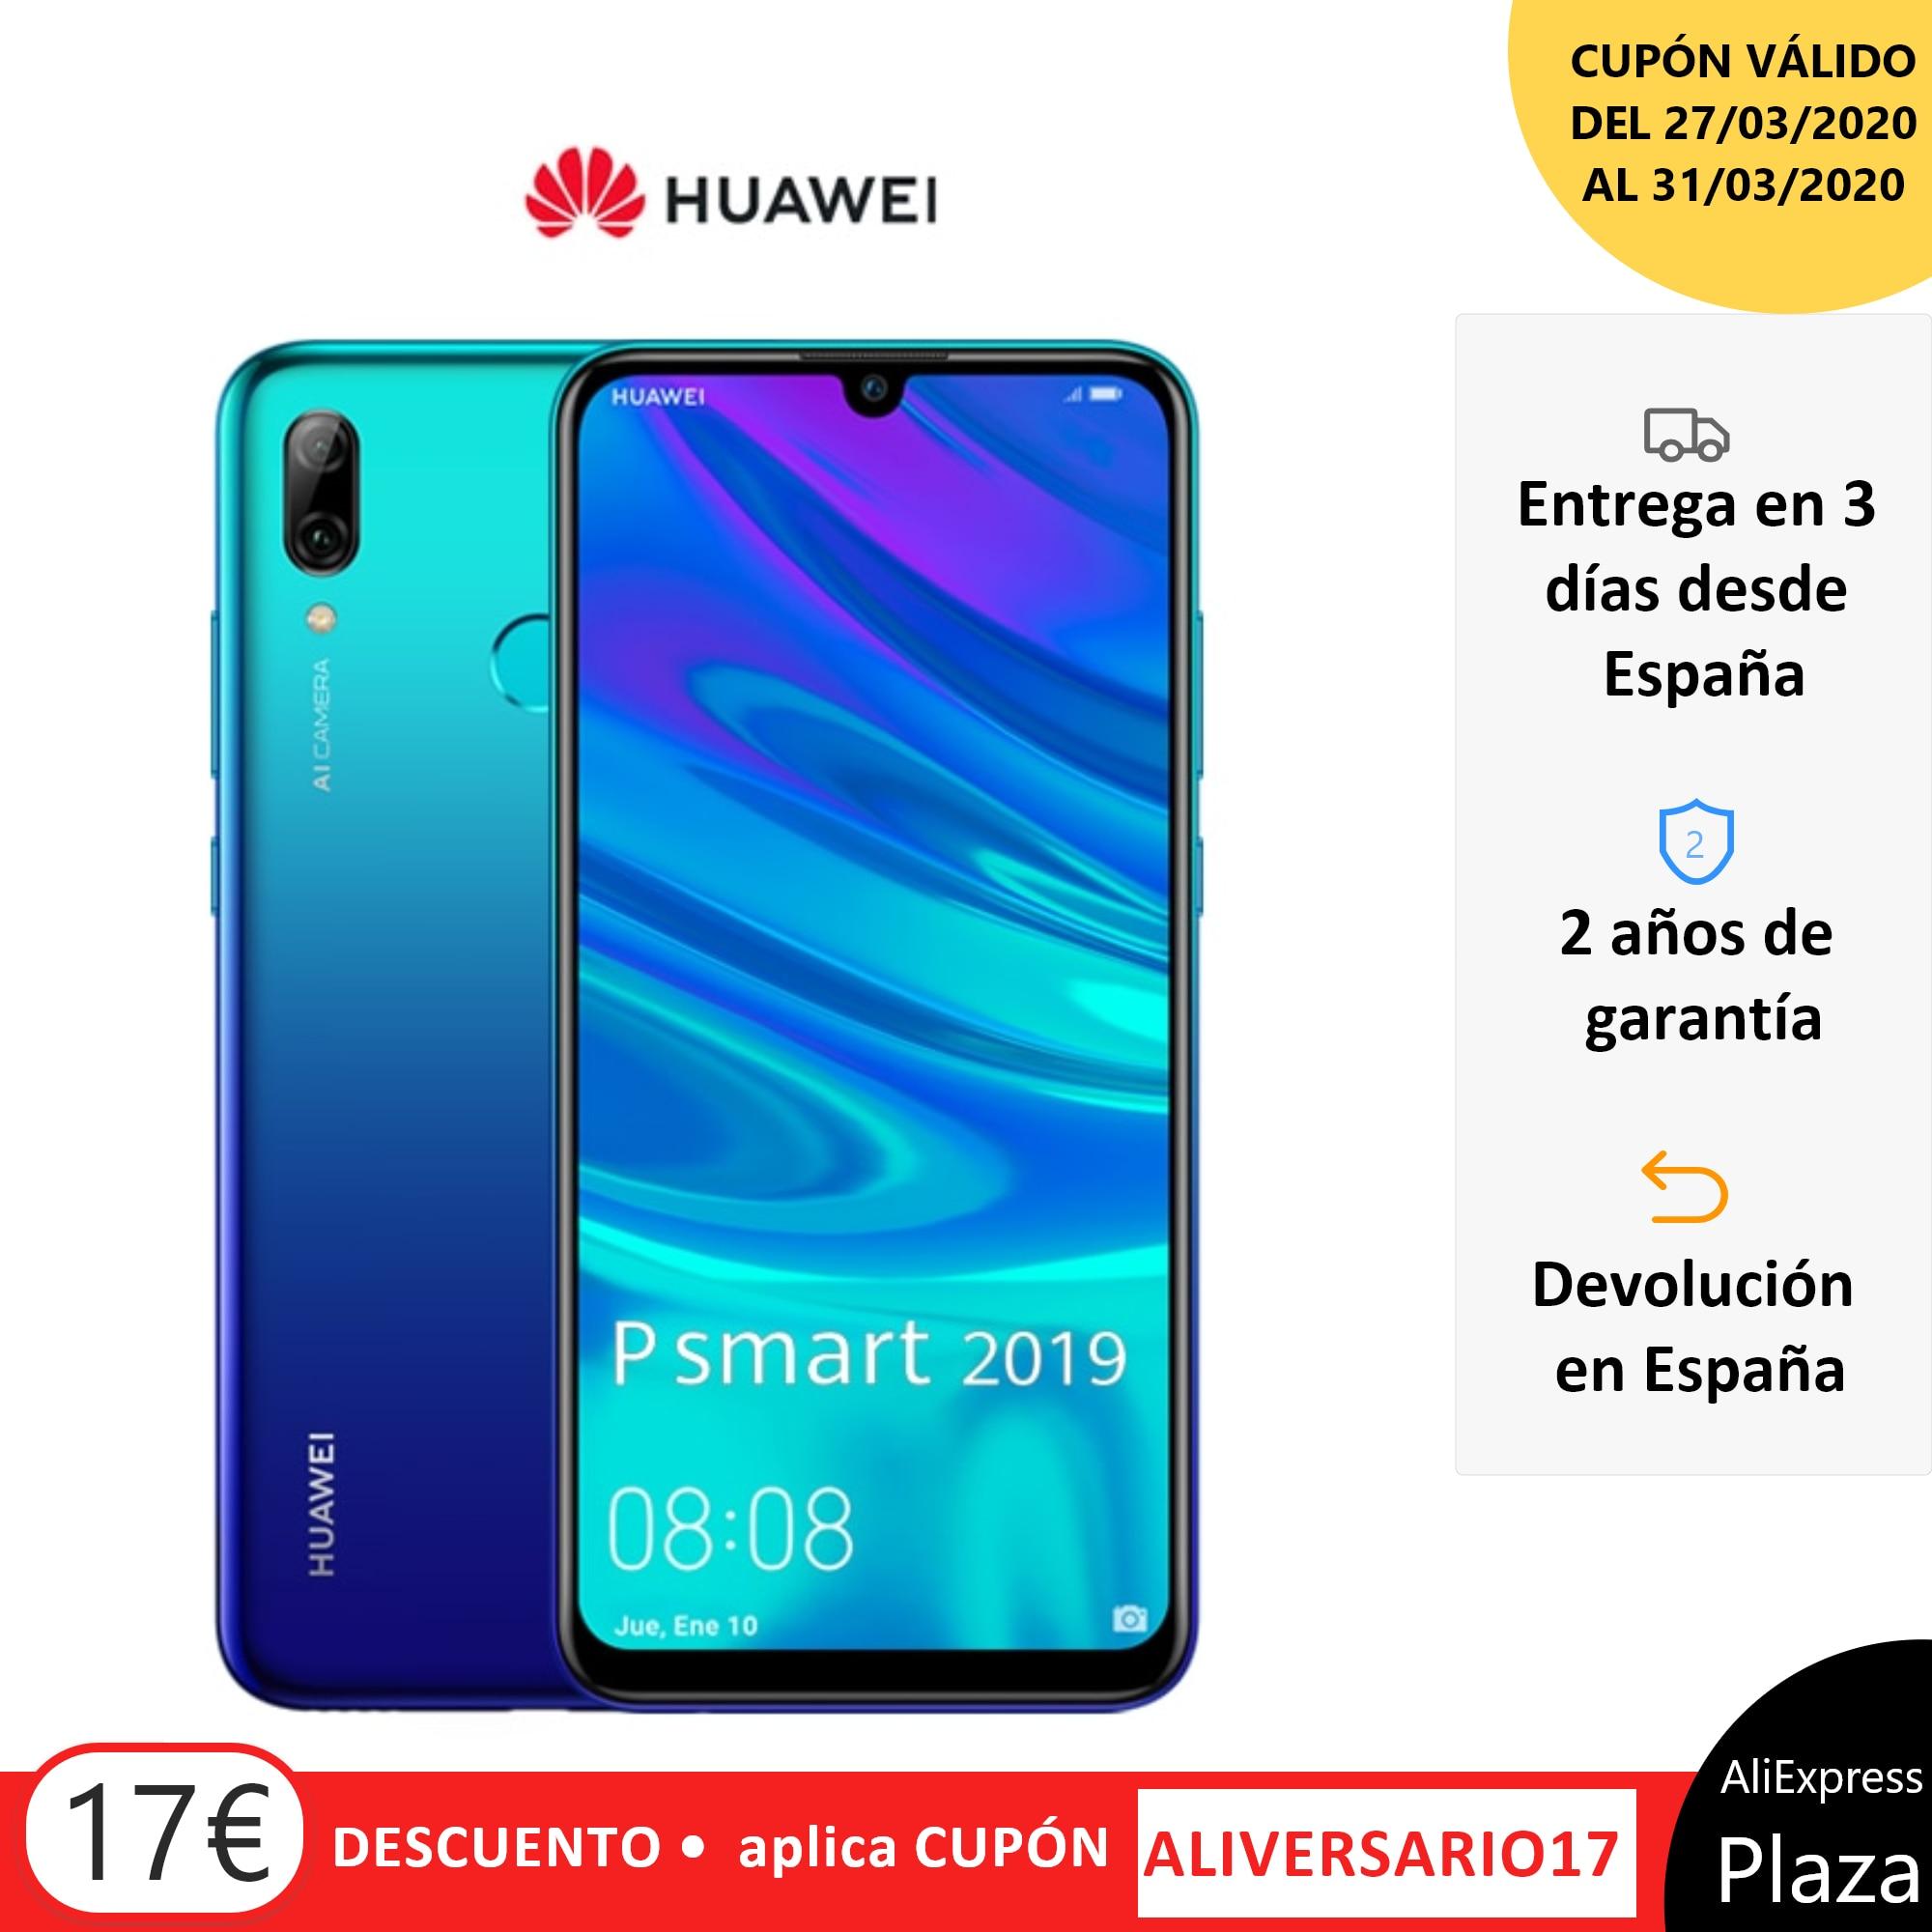 Huawei P Smart 2019 Smartphone(64GB ROM 3GB RAM Google, Android, Nuevo, Libre)[Teléfono Móvil Versión Española]Movil,Moviles